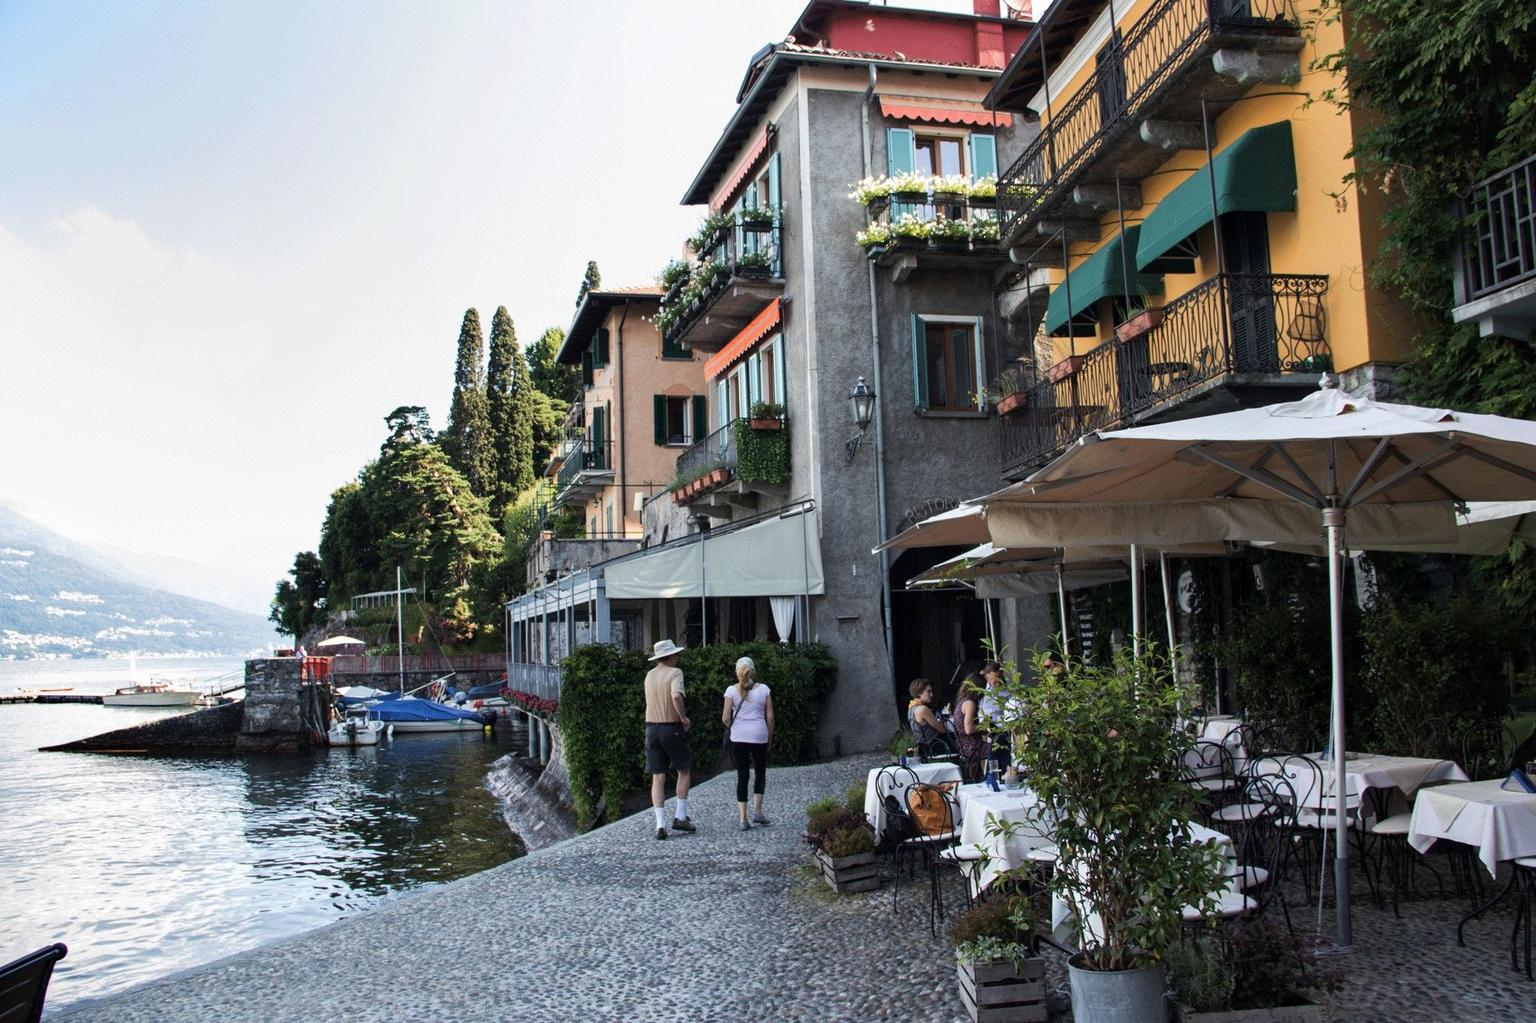 MAIS FOTOS, Private Lake Como and surrounding wine region tour from Milan